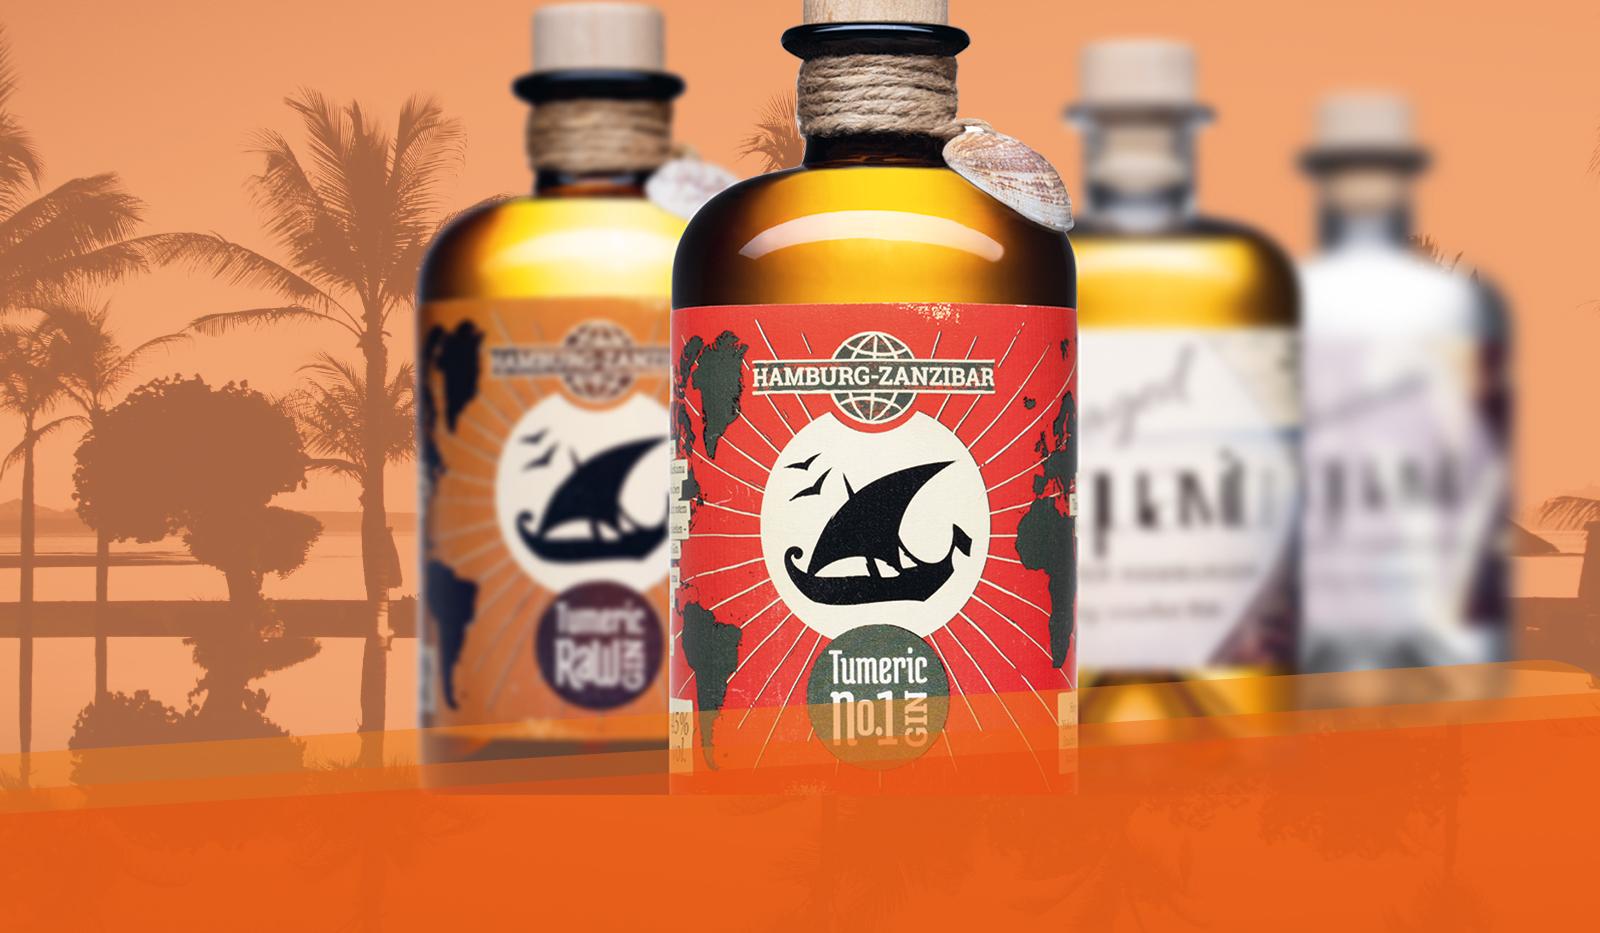 zanzibar gin - Exotisch wie Zanzibar – Zanzibar Gin